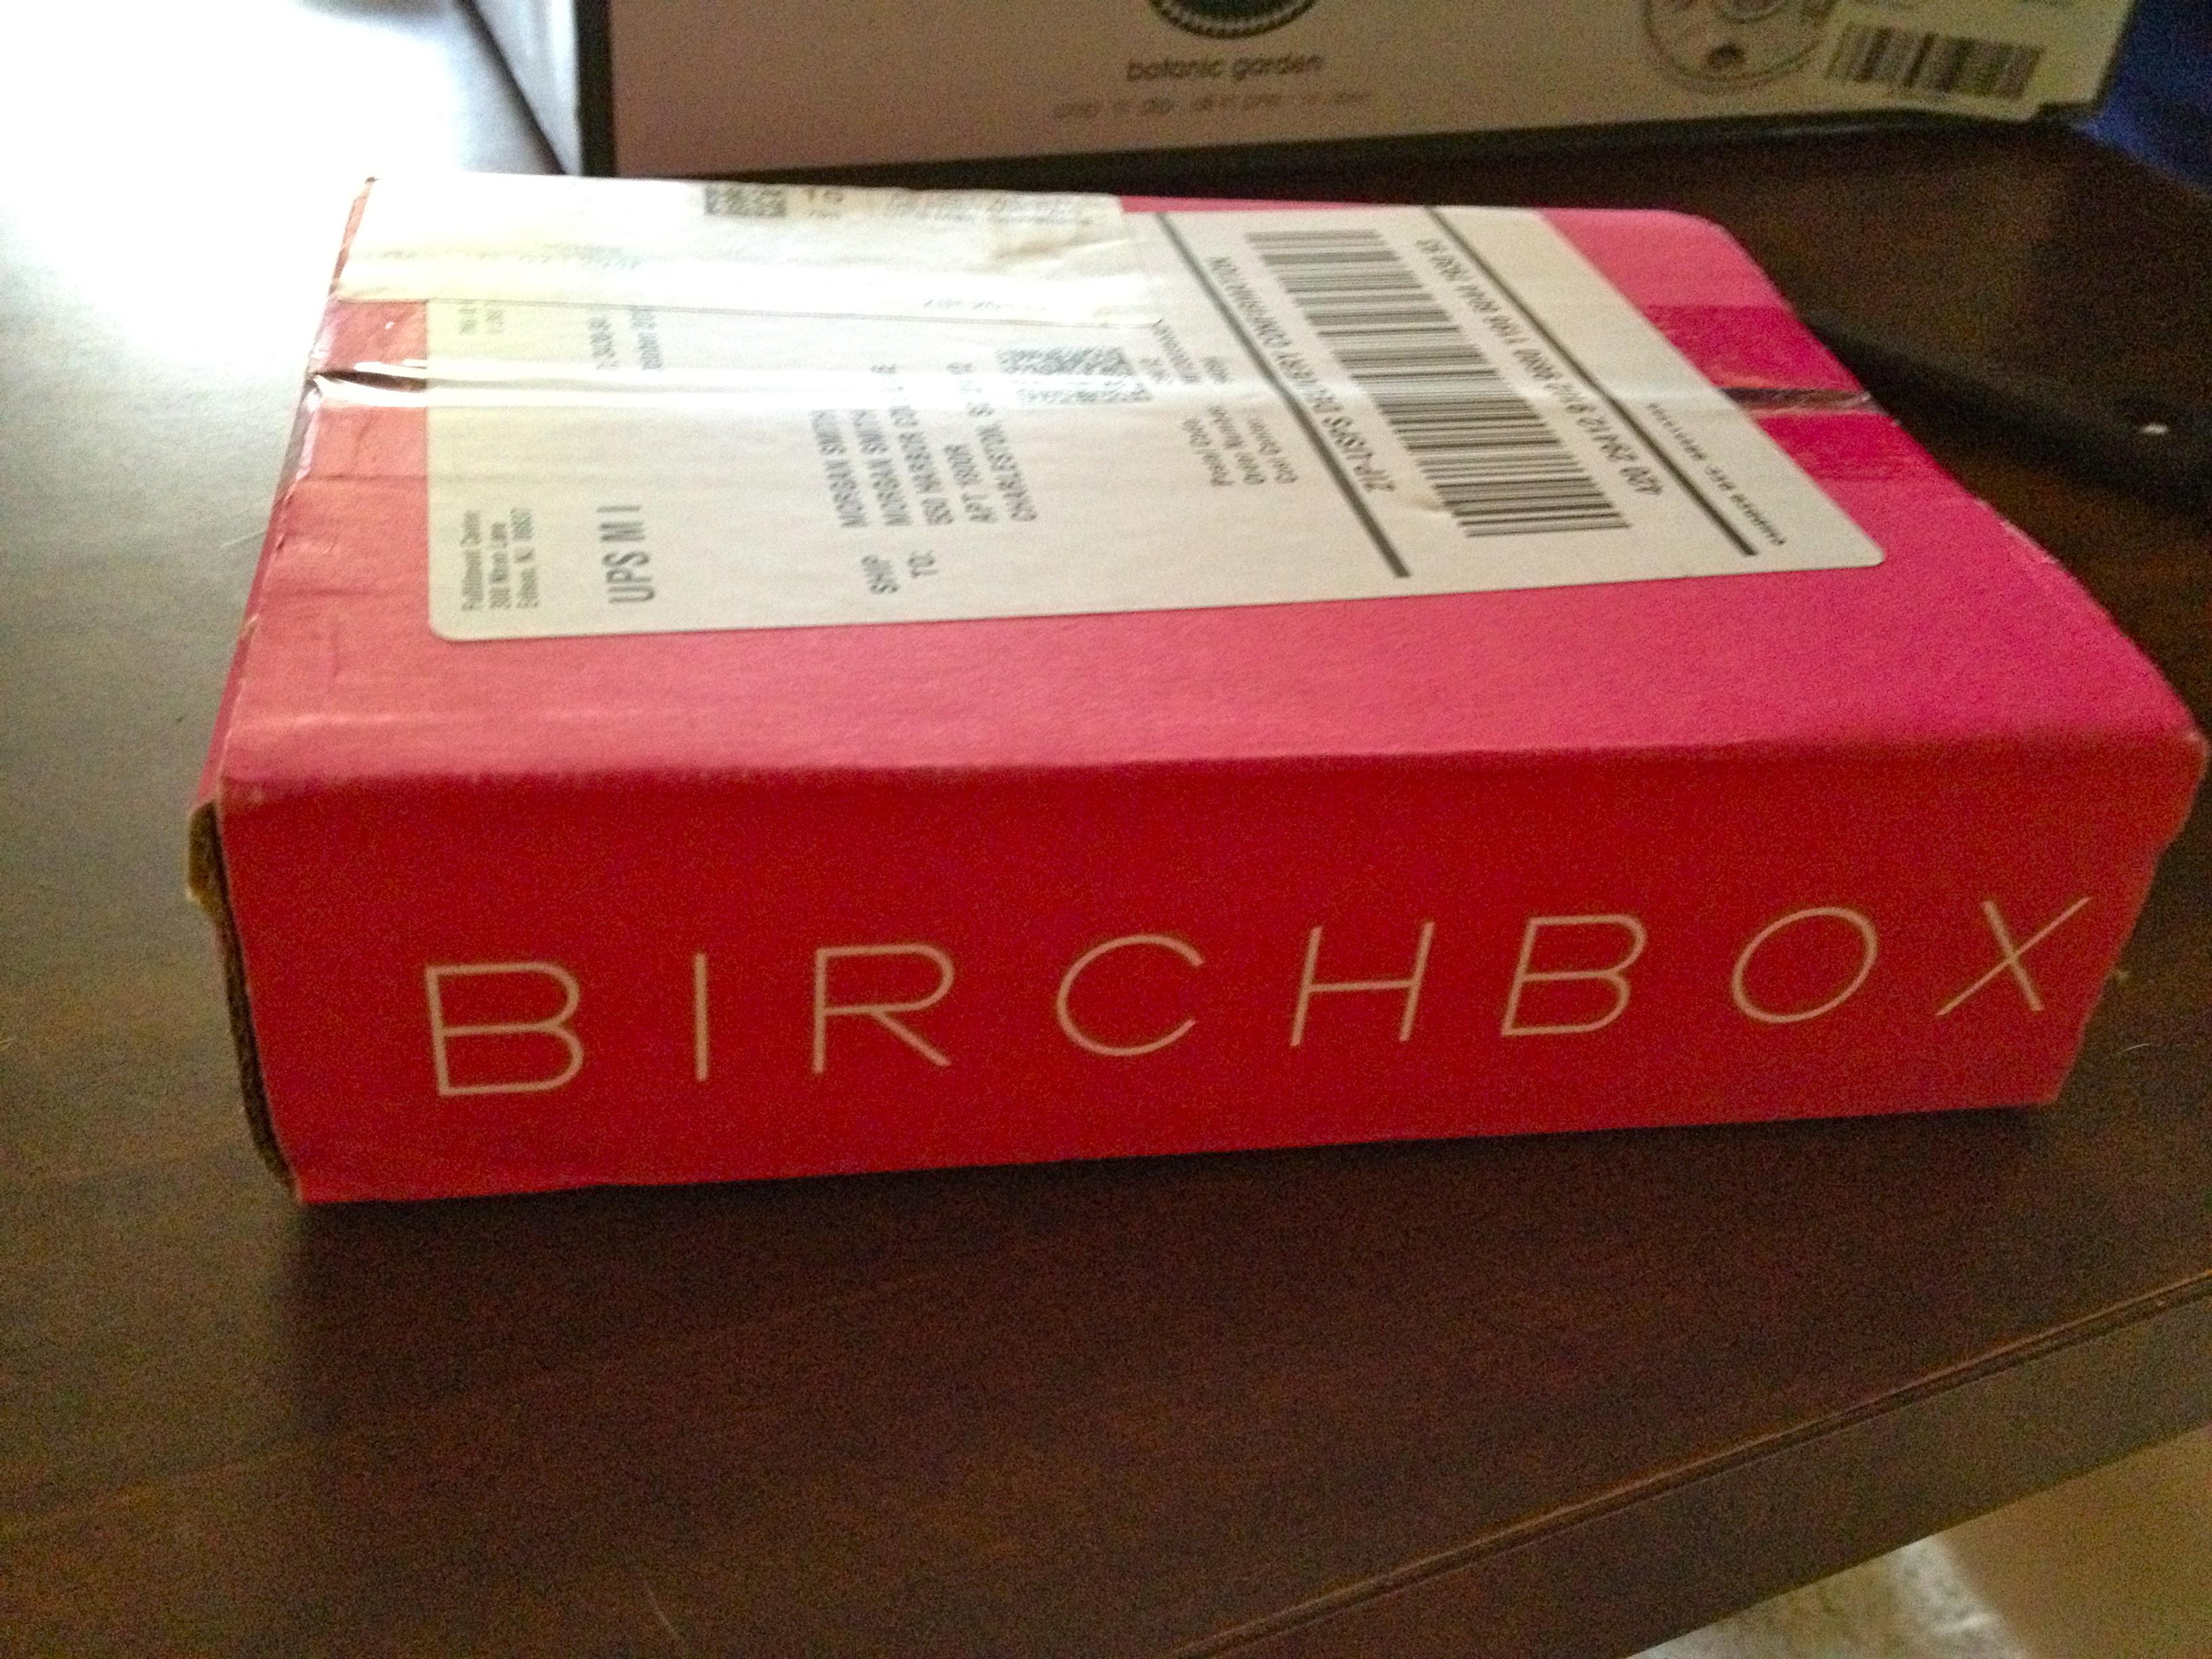 Do You Birch Box?